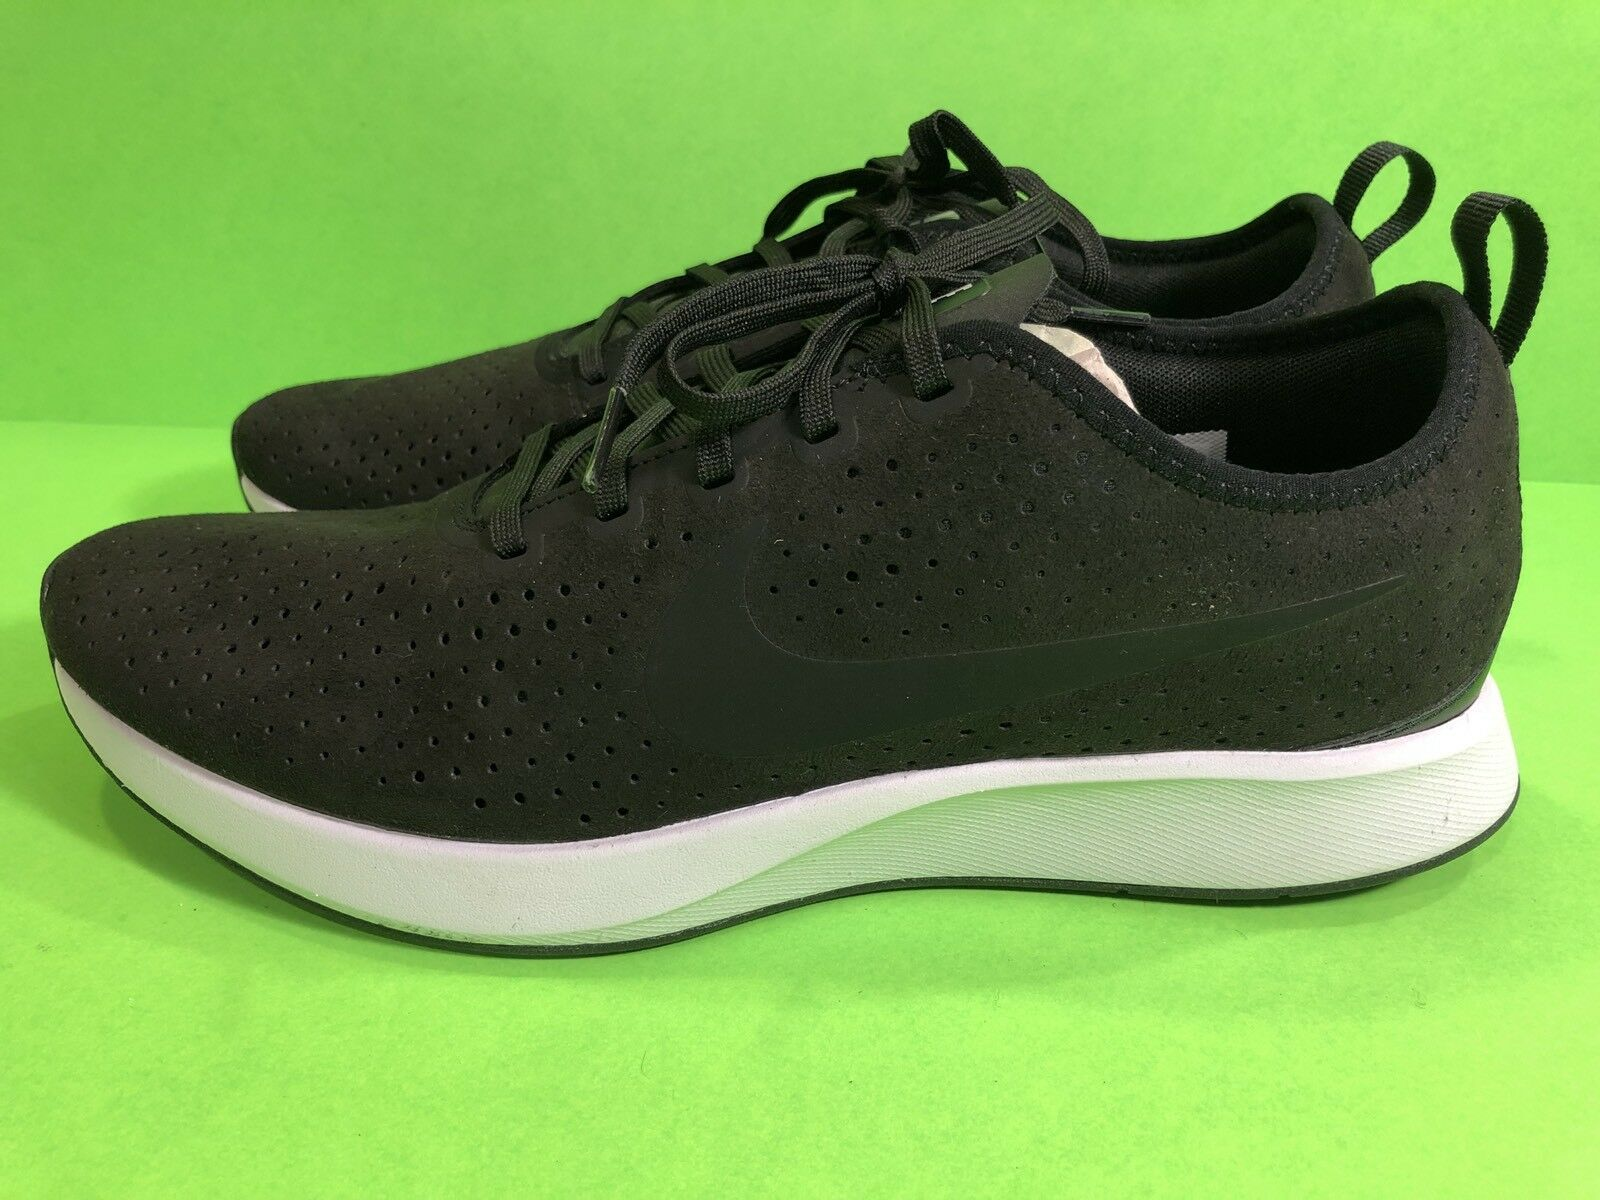 New Nike DualTone Racer Premium 9.5 Color Black White Free Shipping 924448-002